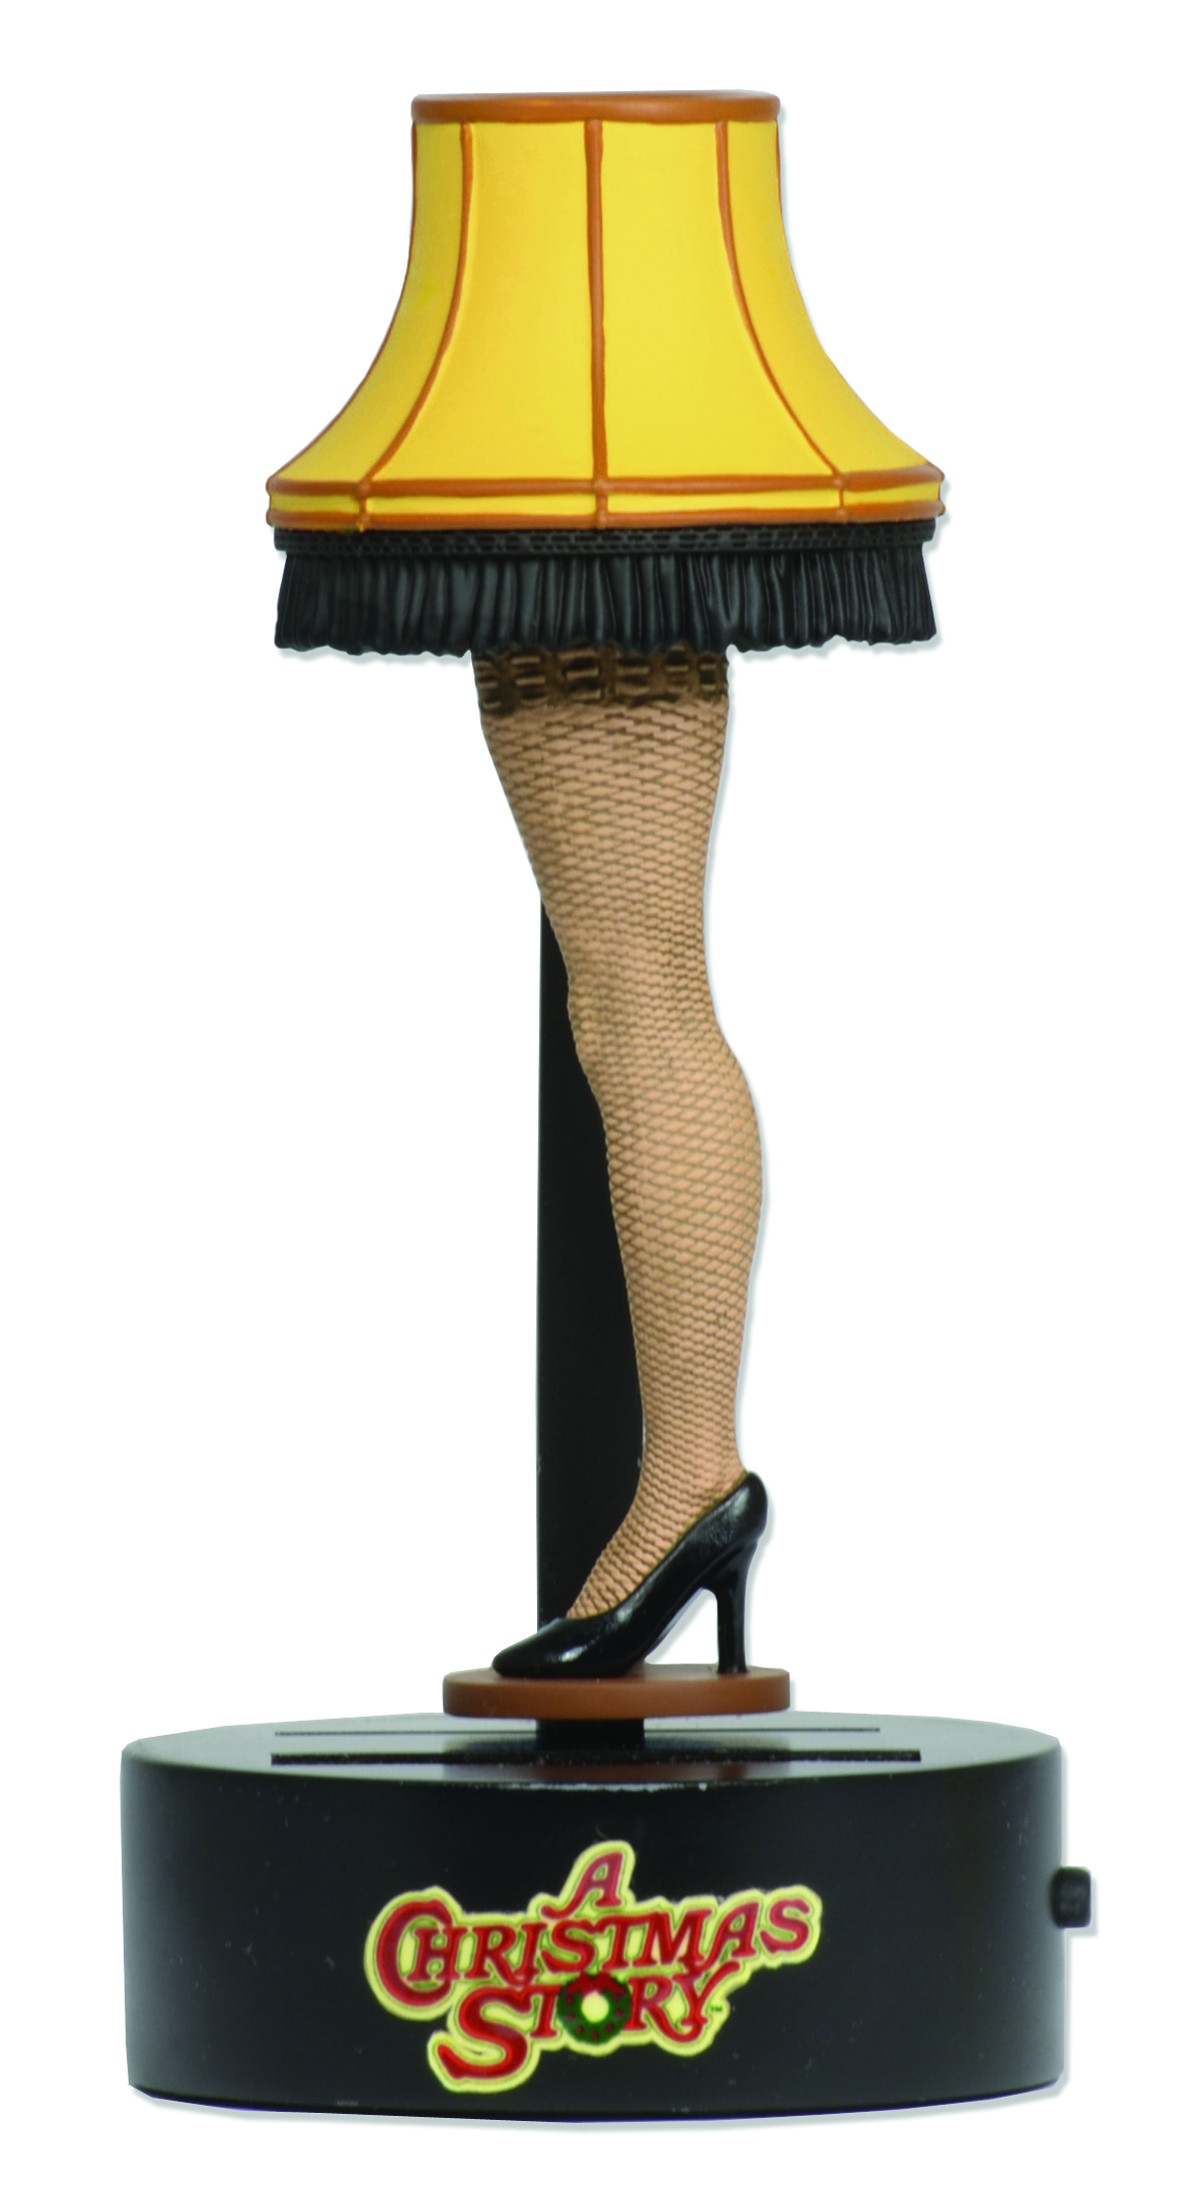 The Christmas Story Leg Lamp  PREVIEWSworld CHRISTMAS STORY LEG LAMP BODY KNOCKER